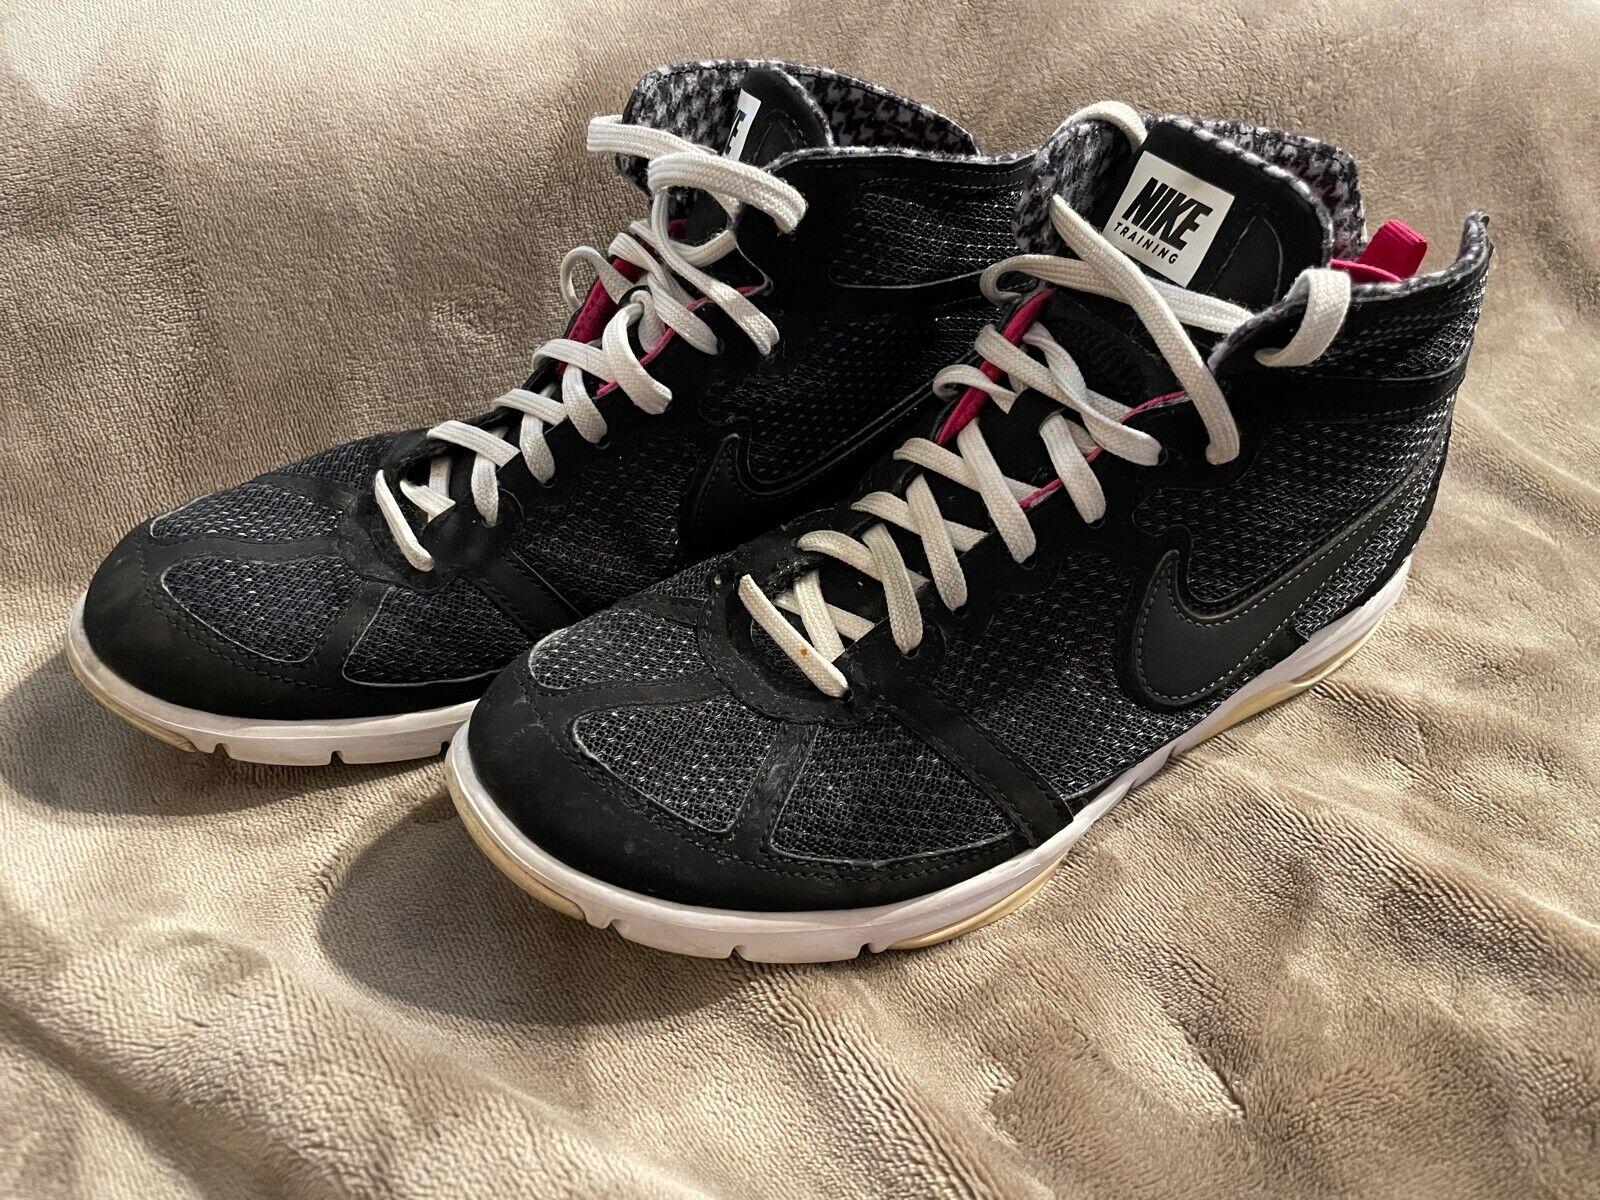 Femmes Nike Air Entraînement Max S2S Mi Baskets Noir Rose Blanc Taille 8.5